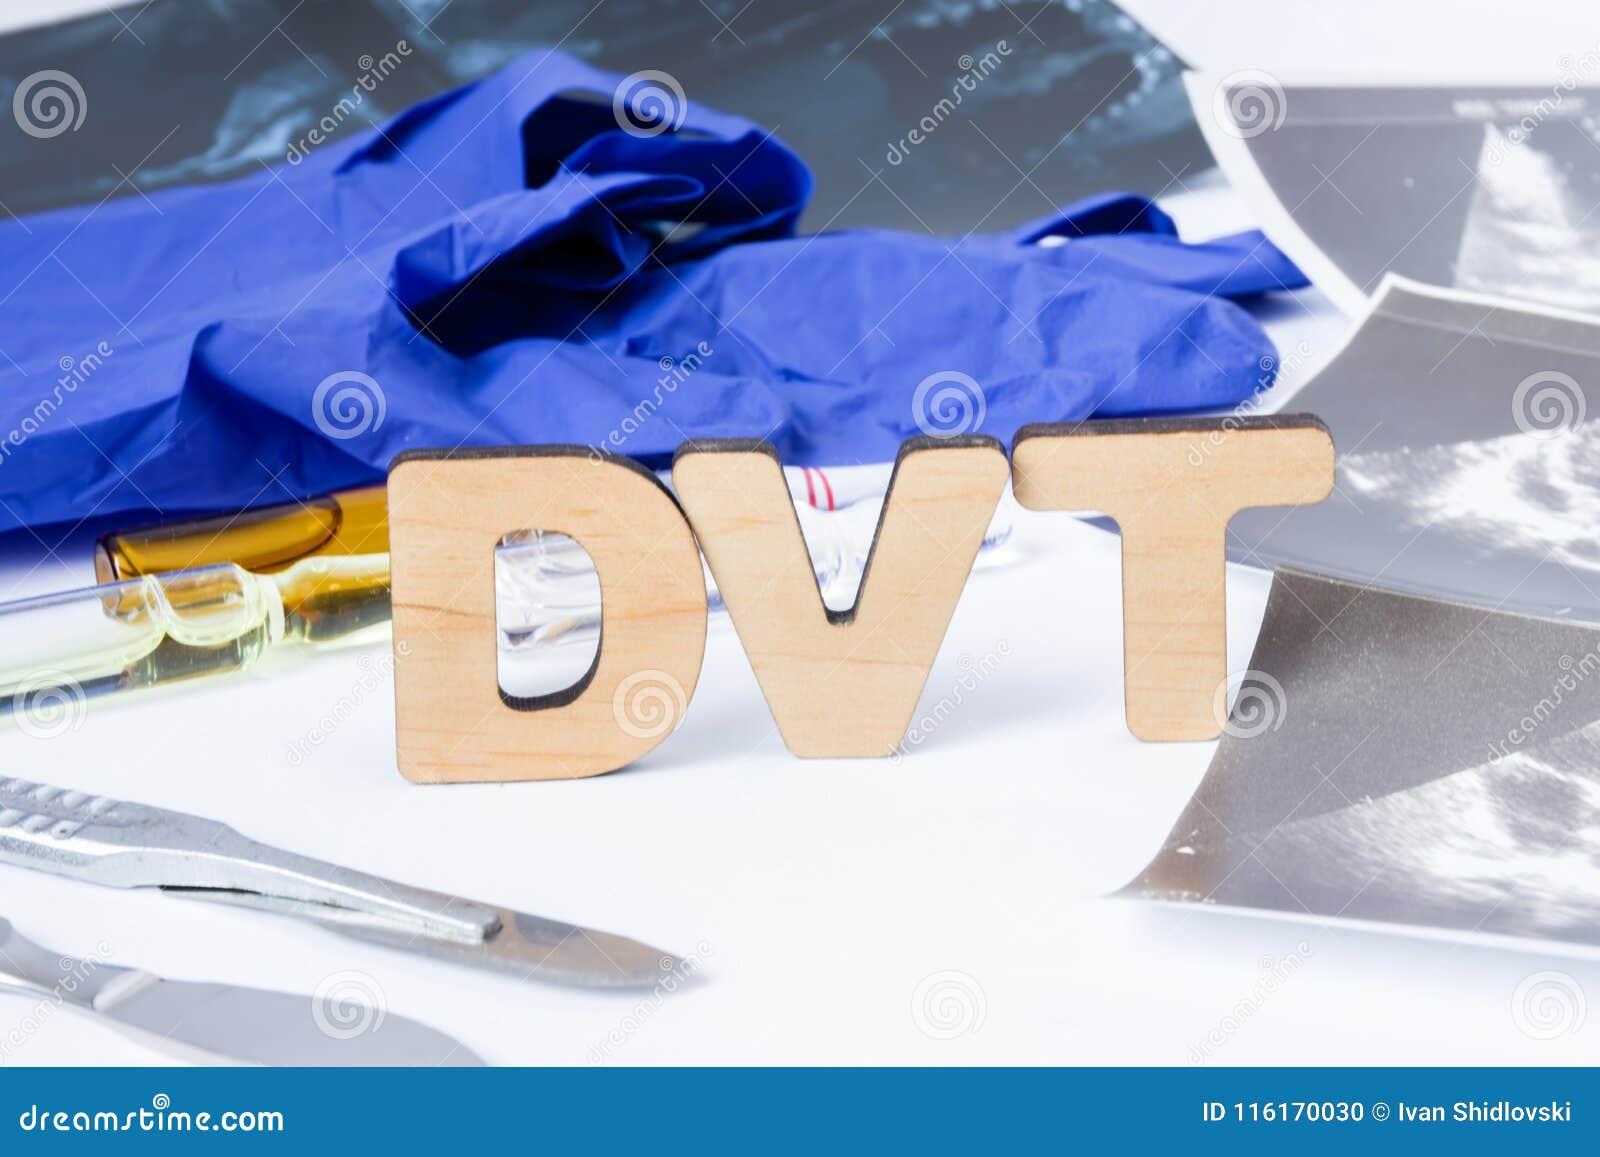 DVT深刻的静脉血栓形成,在静脉的血块的首字母缩略词或简称在我们的身体里面 诊断的治疗的照片概念